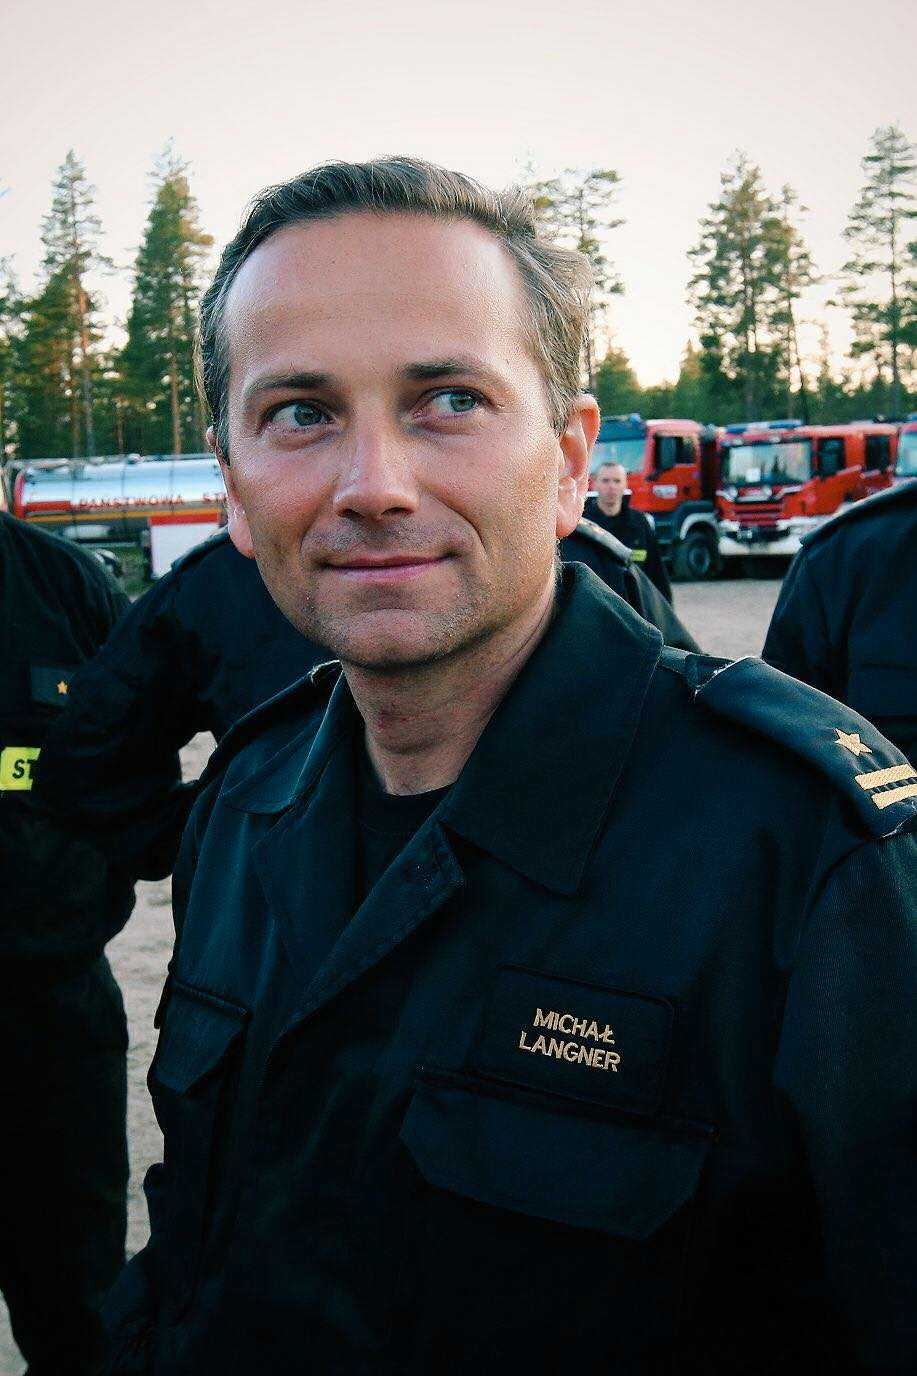 Michal Langer.